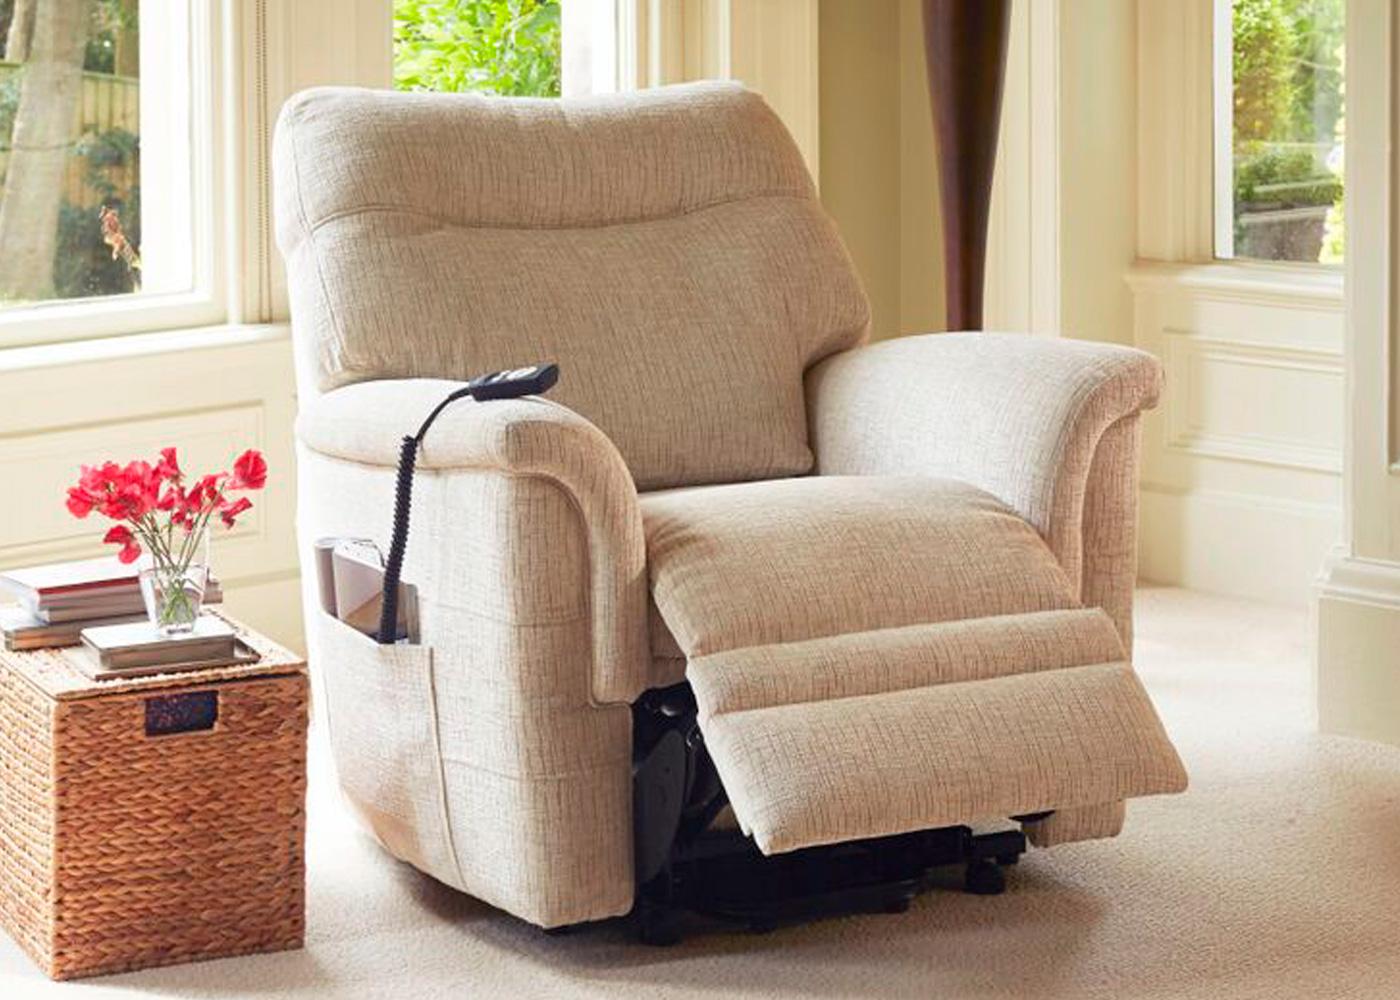 2 seater power recliner sofa green vintage parker knoll seattle - midfurn furniture superstore